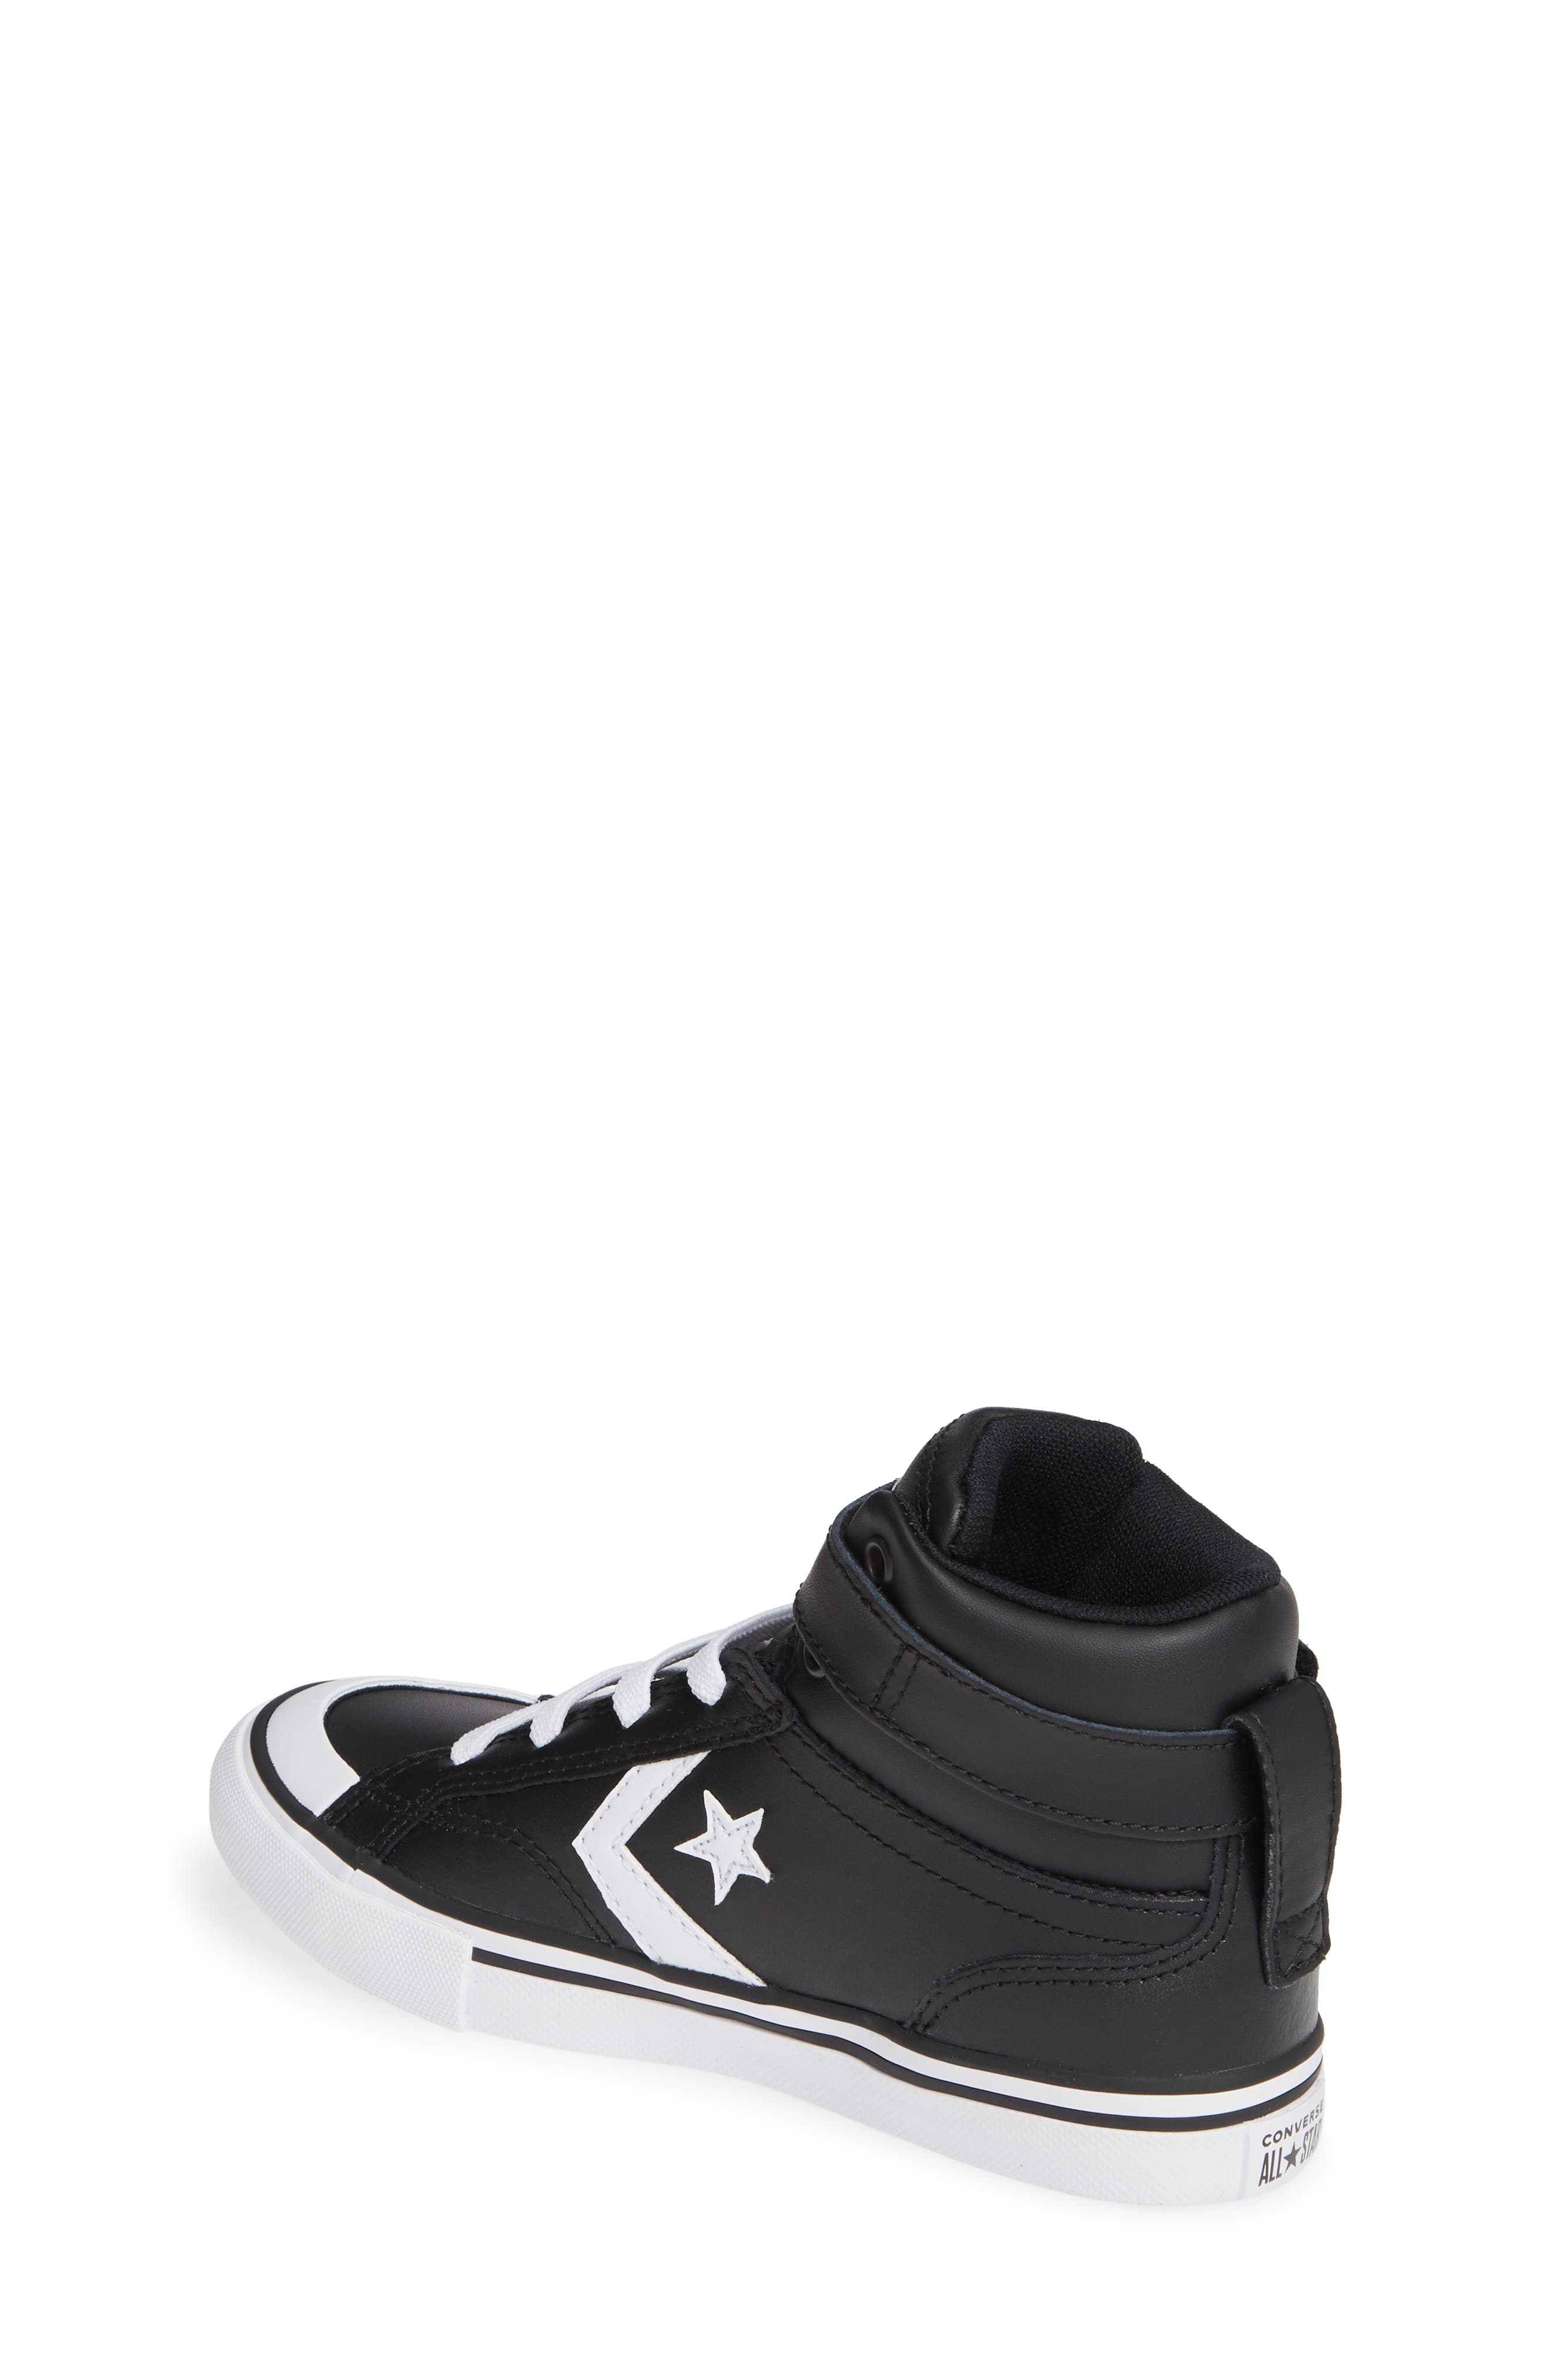 CONVERSE, Pro Blaze High Top Sneaker, Alternate thumbnail 2, color, BLACK/ WHITE/ WHITE